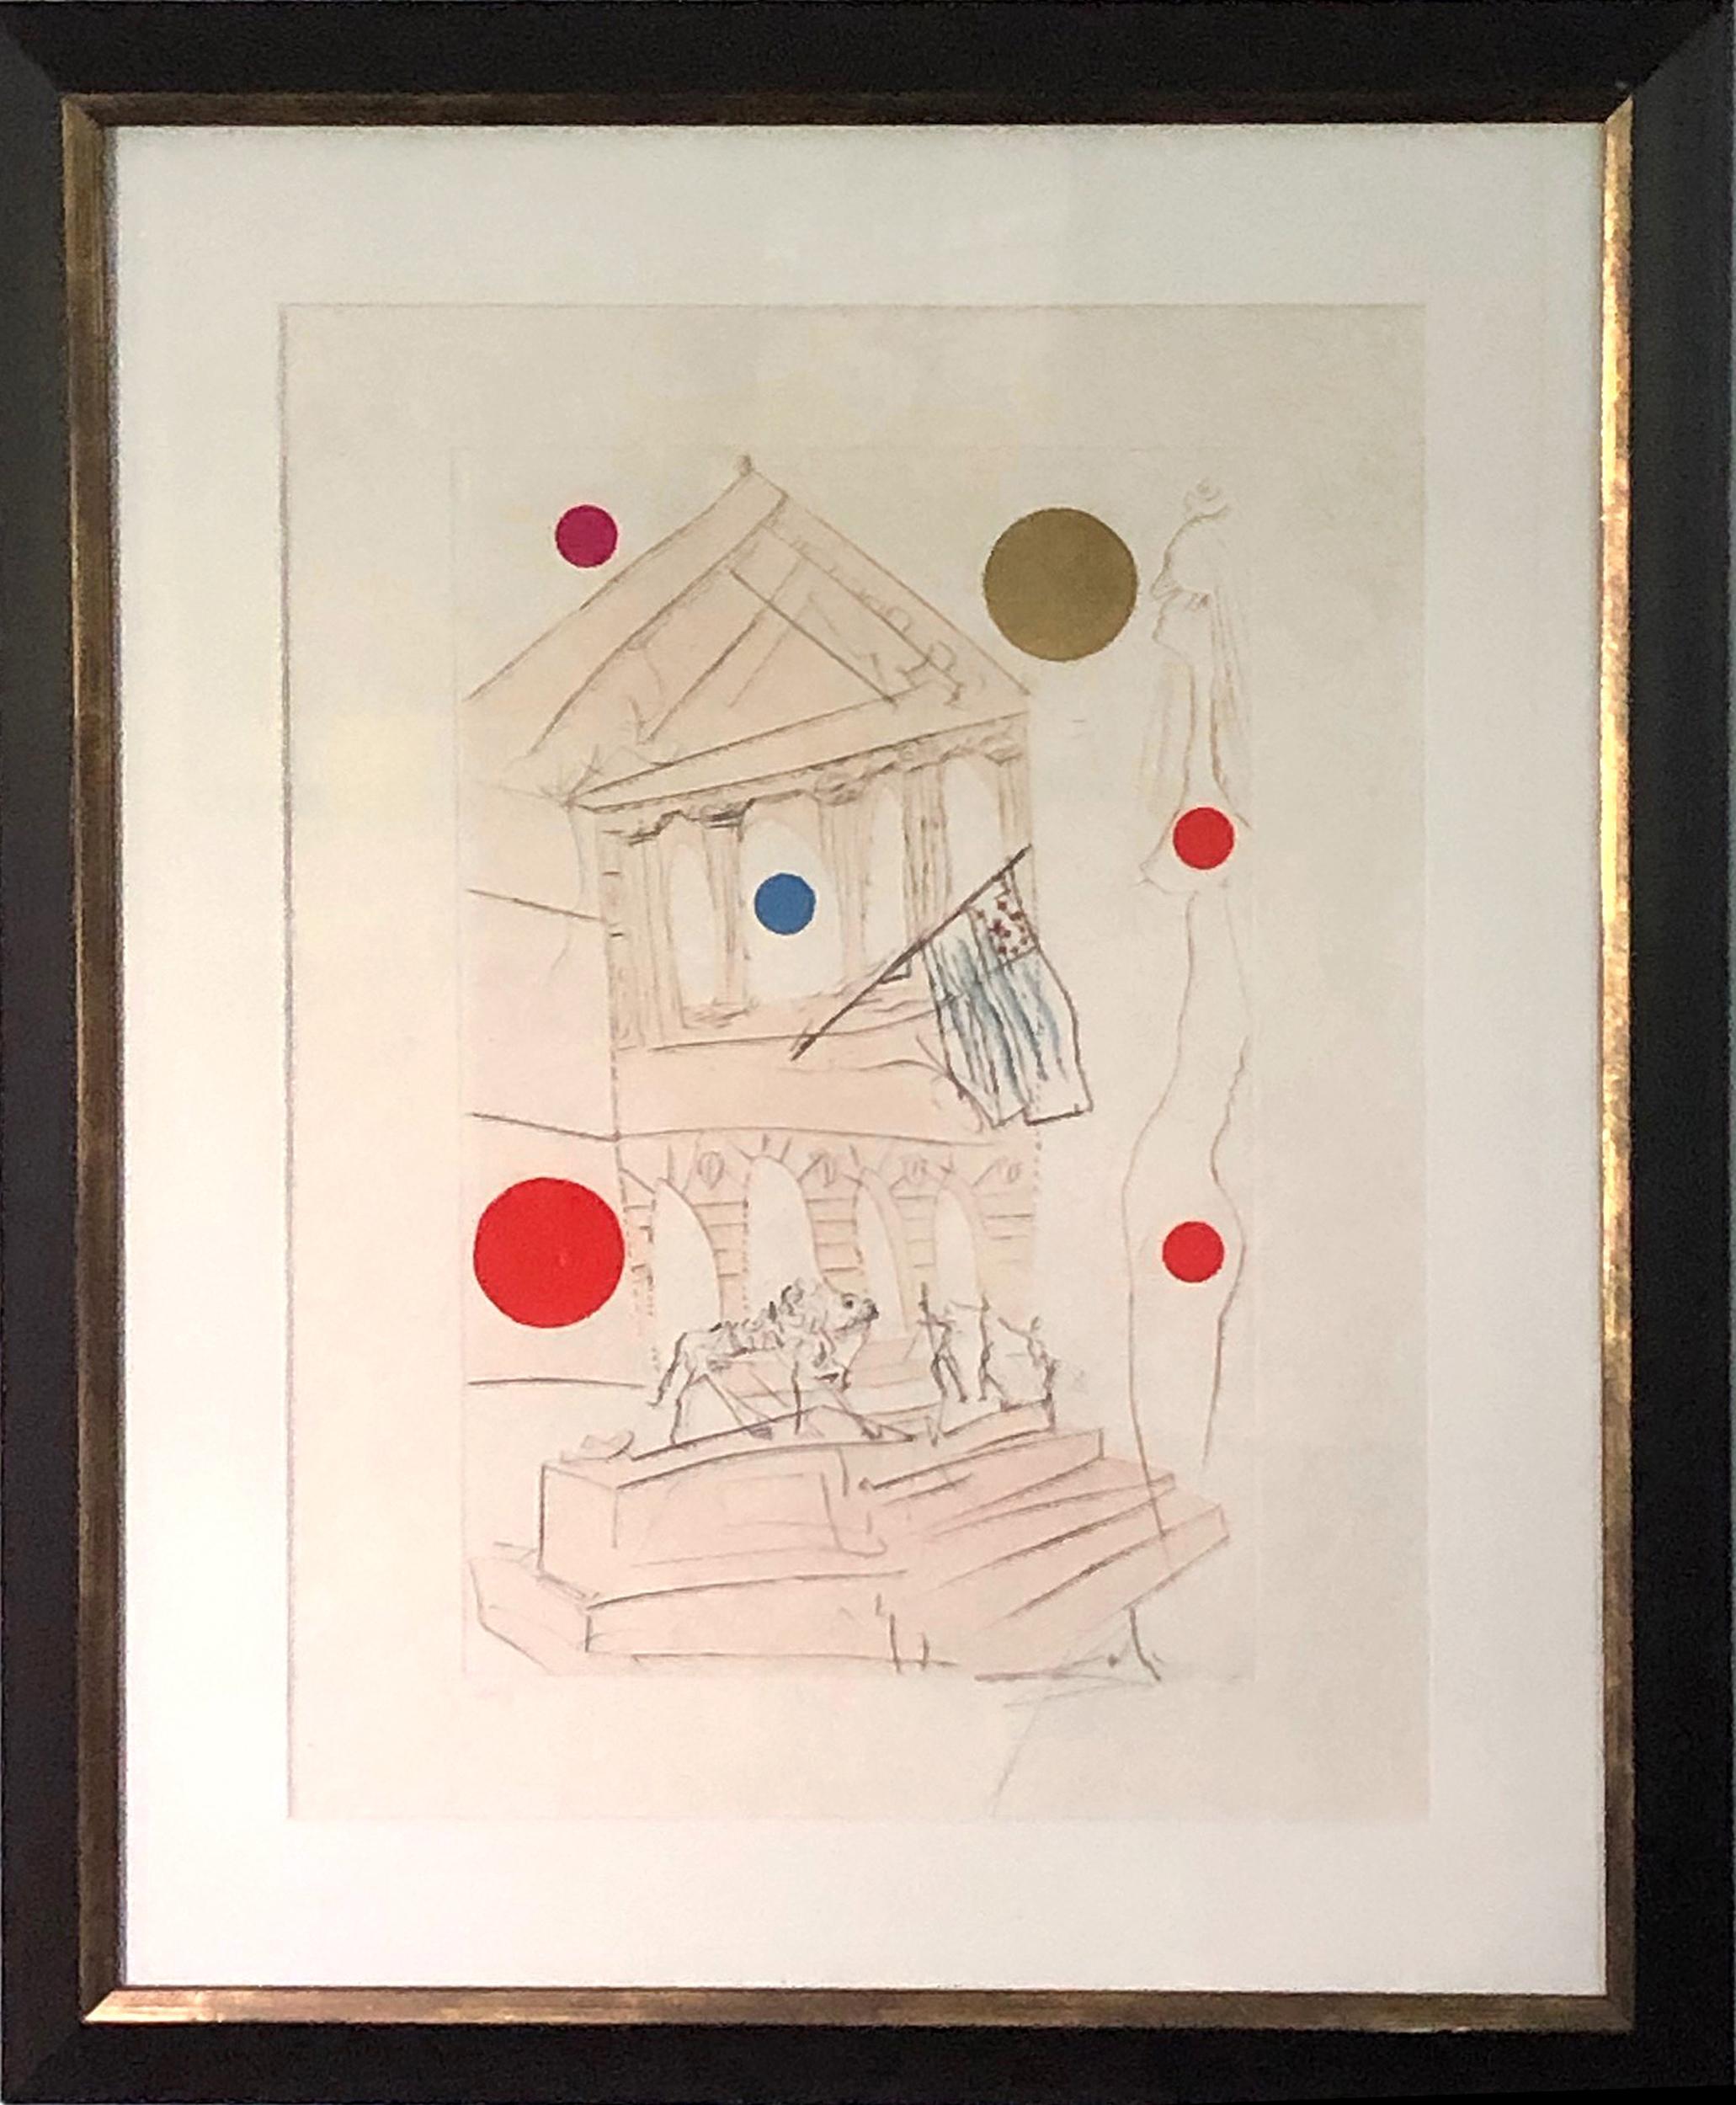 Salvador Dali, The Art Institute, Etching